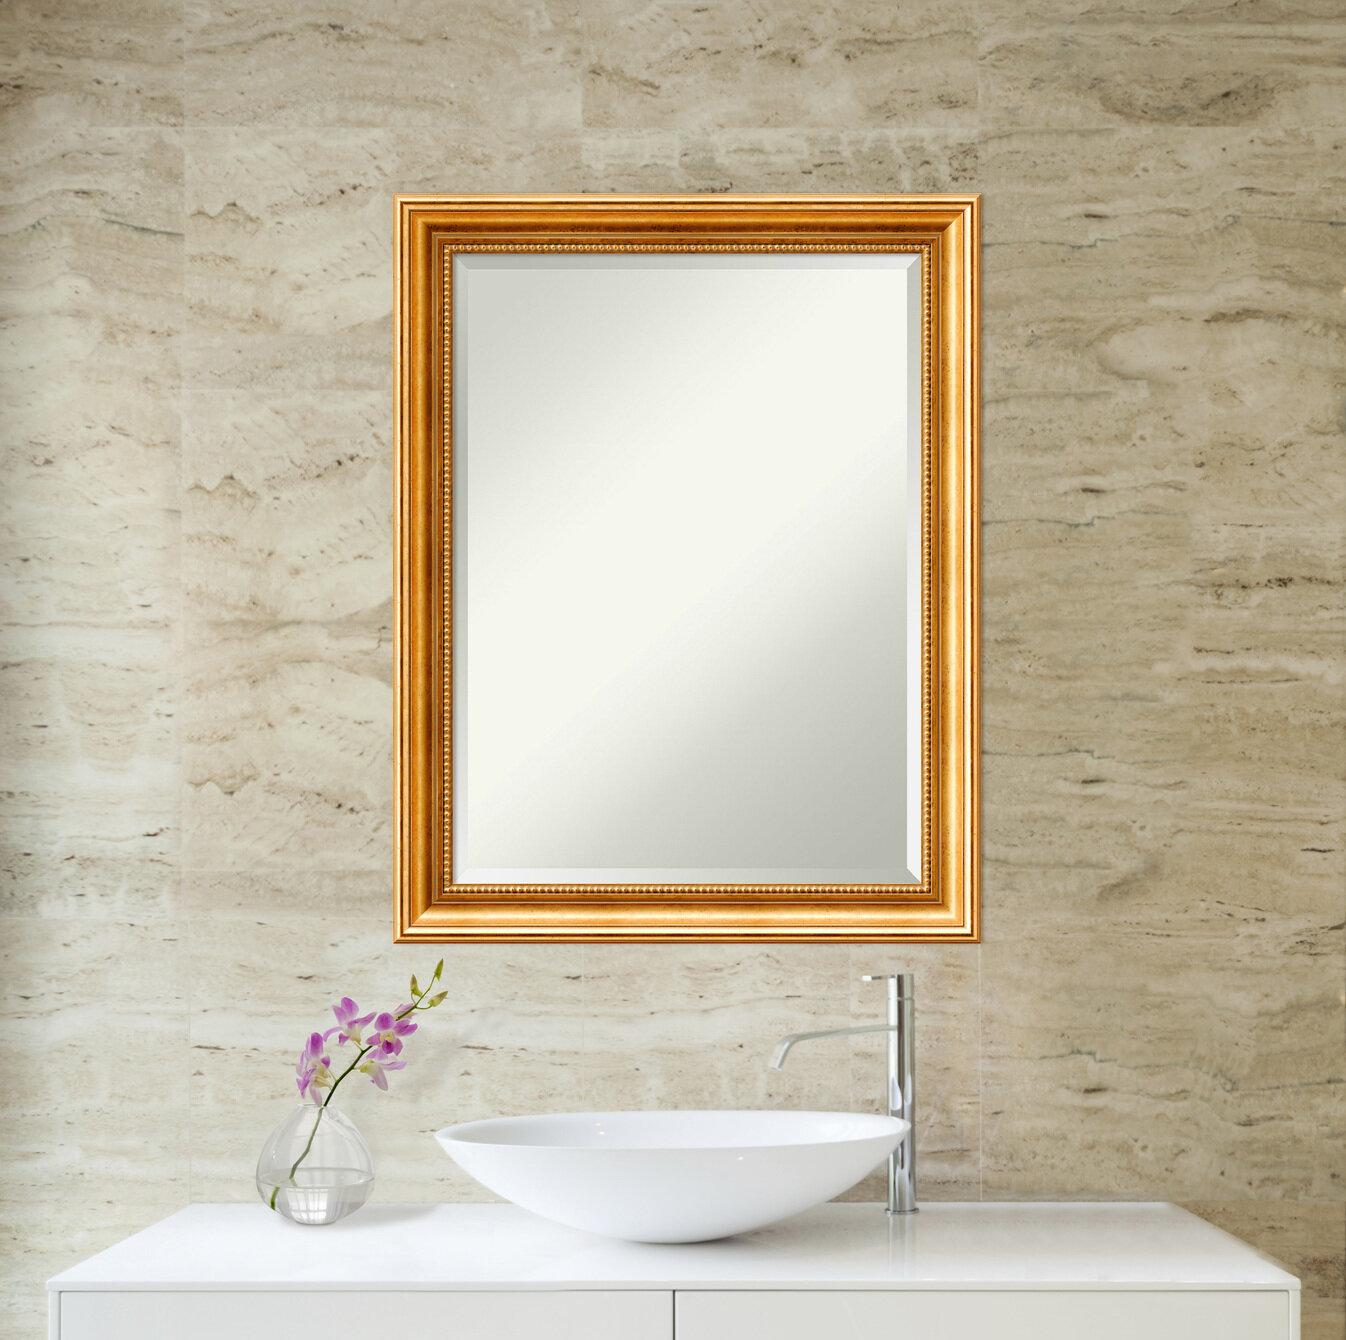 Traditional Beveled Bathroom Vanity Mirror